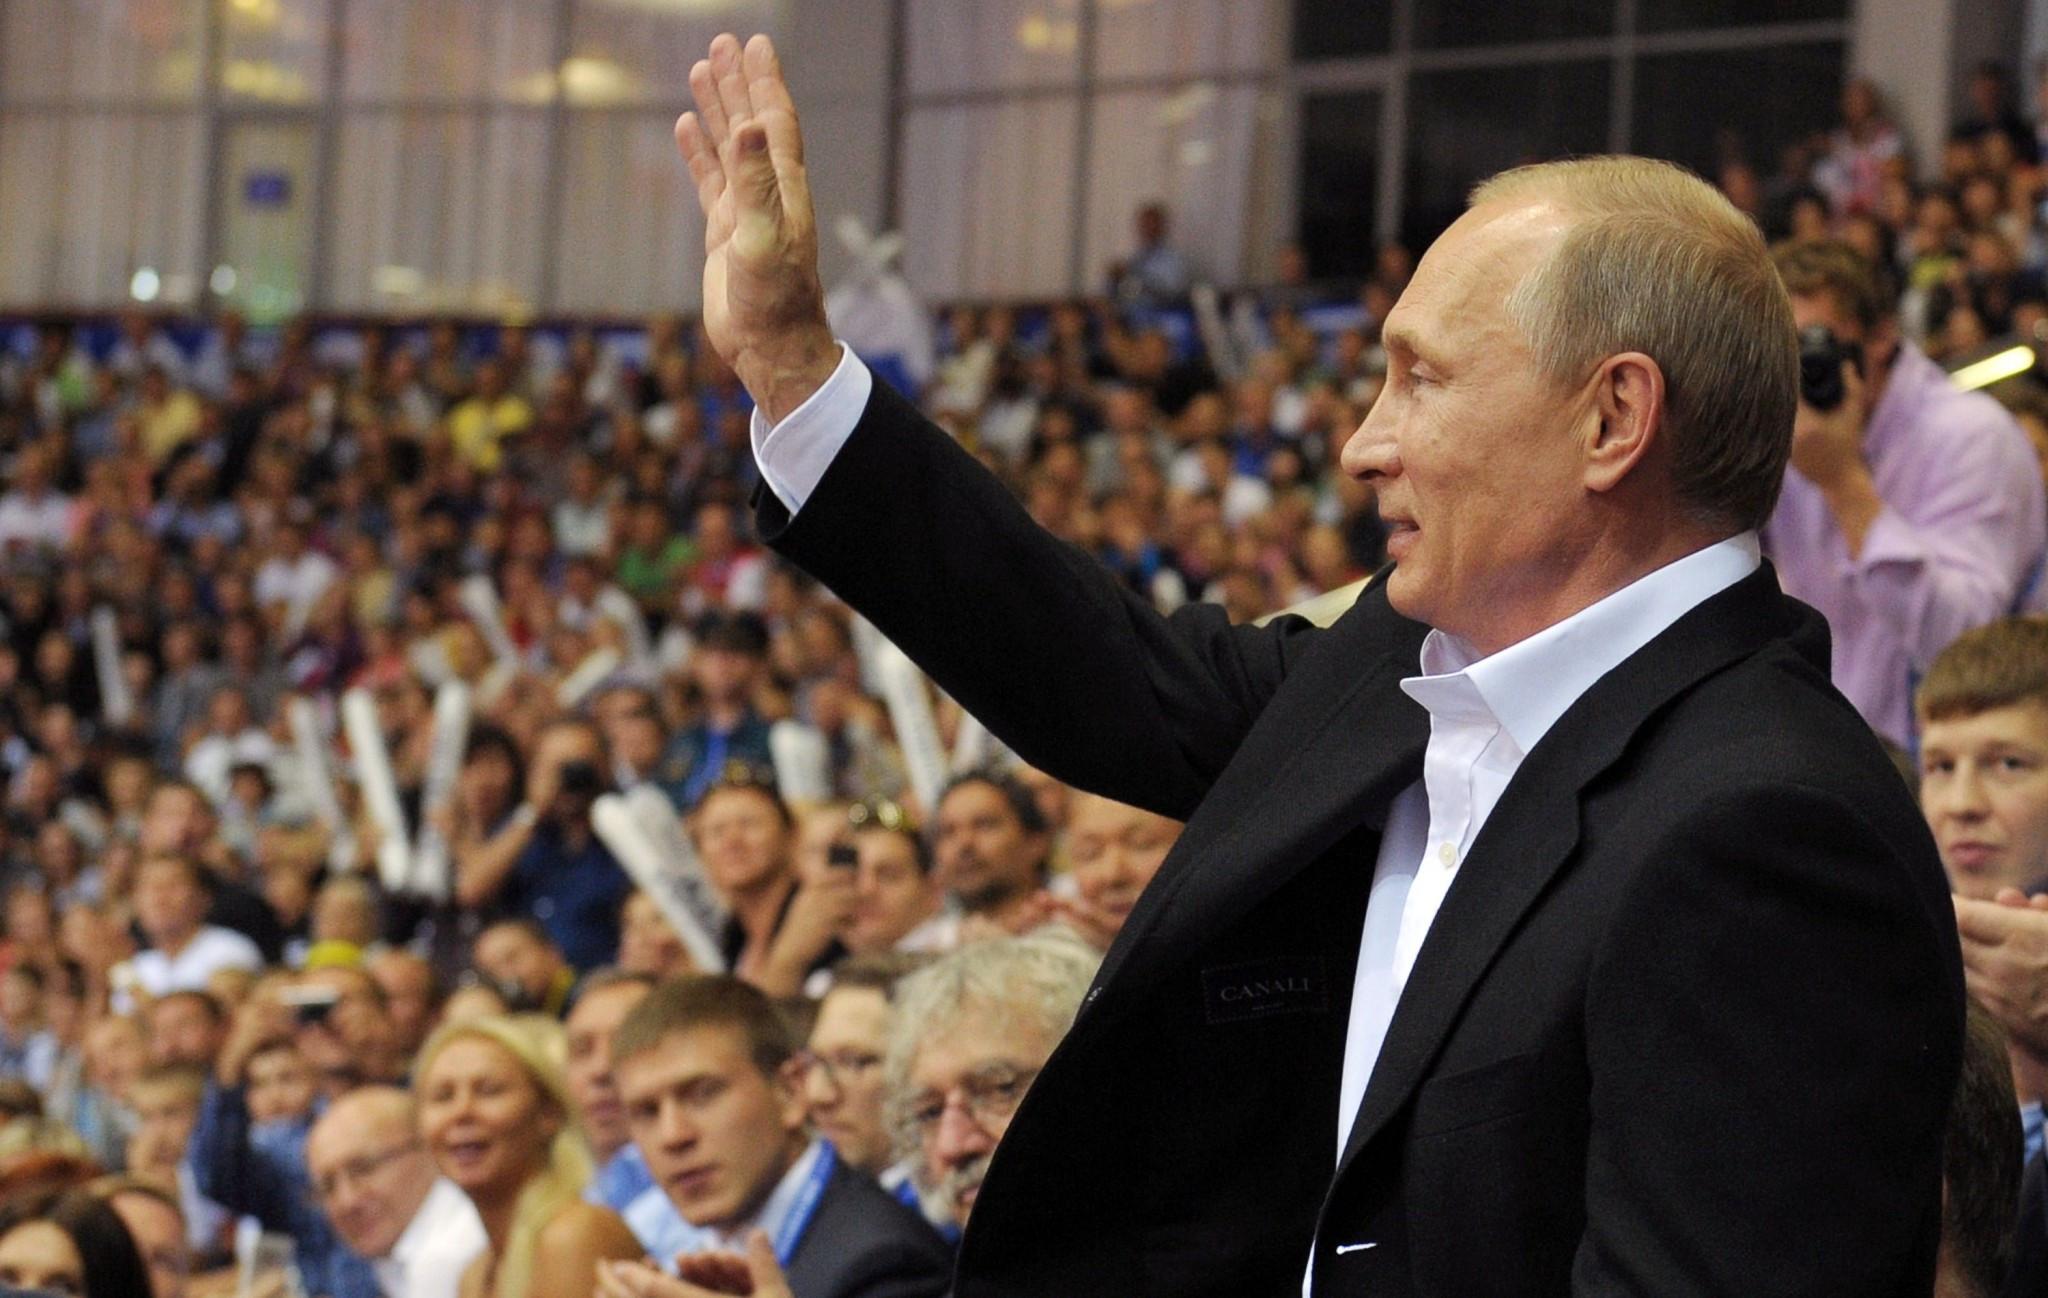 Russian President Vladimir Putin last visited the IJF World Championships in  Chelyabinsk three years ago ©Getty Images